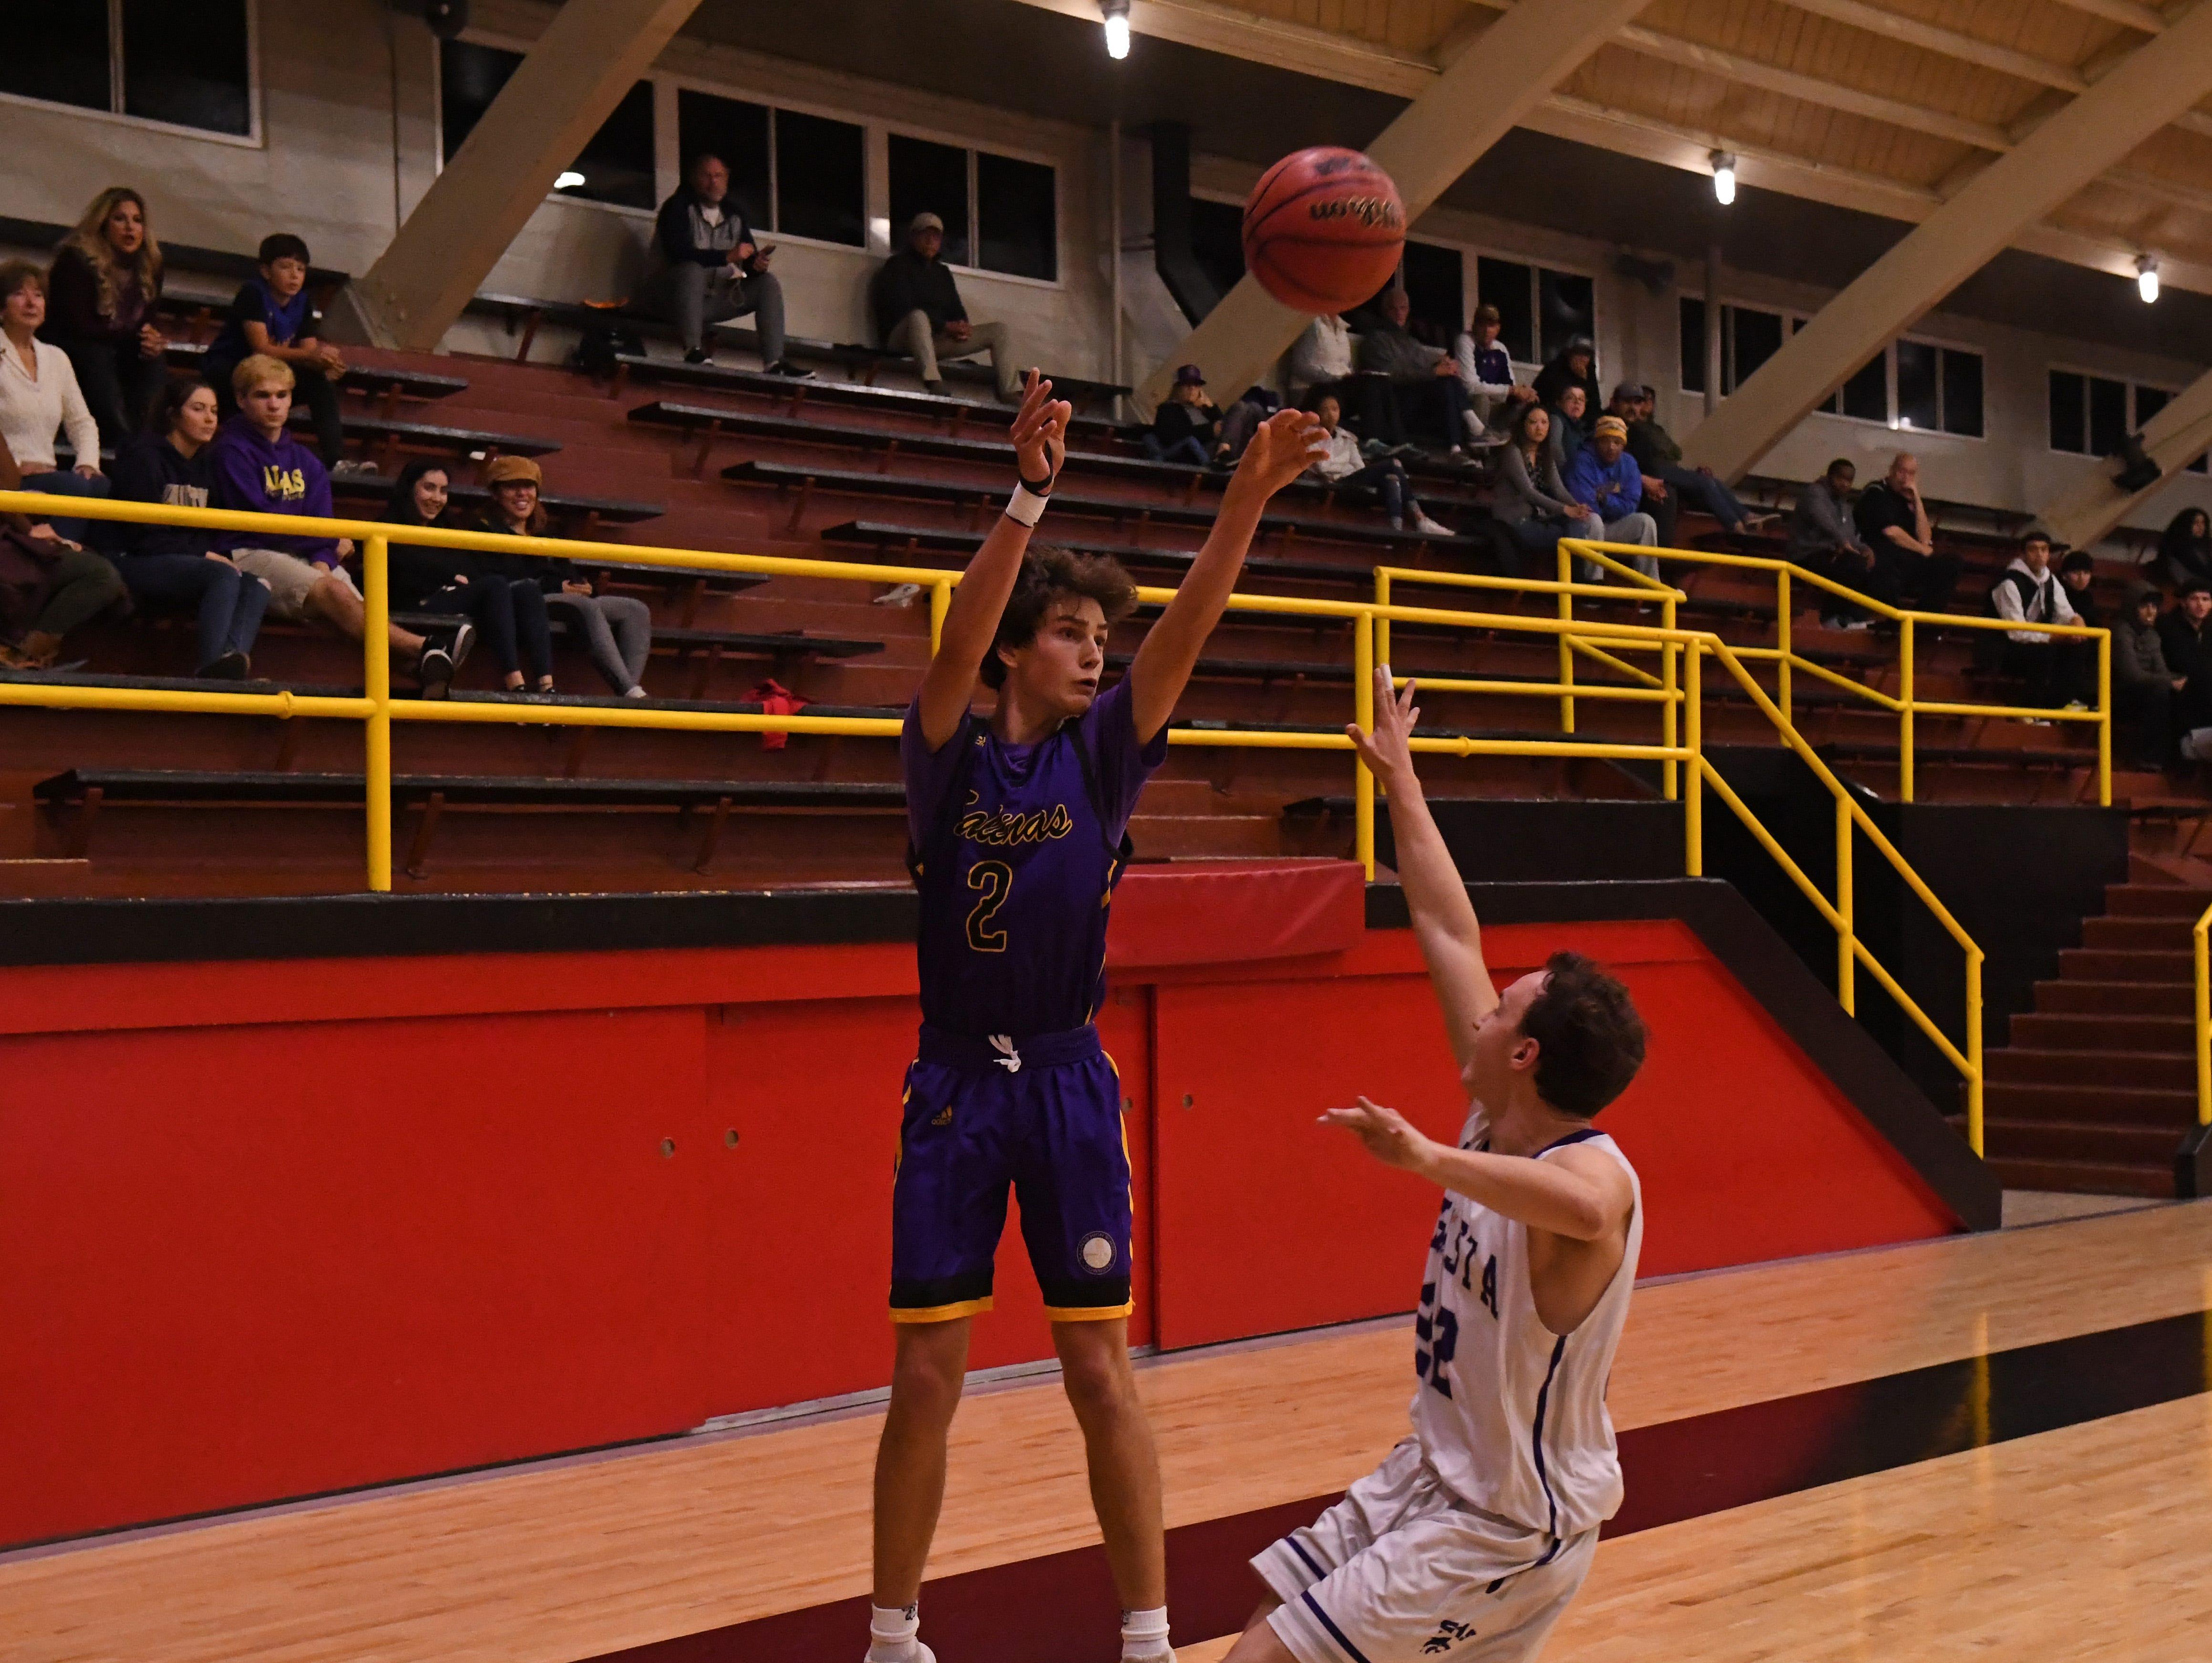 Salinas guard Parker Horton (2) fires off a 3-pointer over a closing defender.